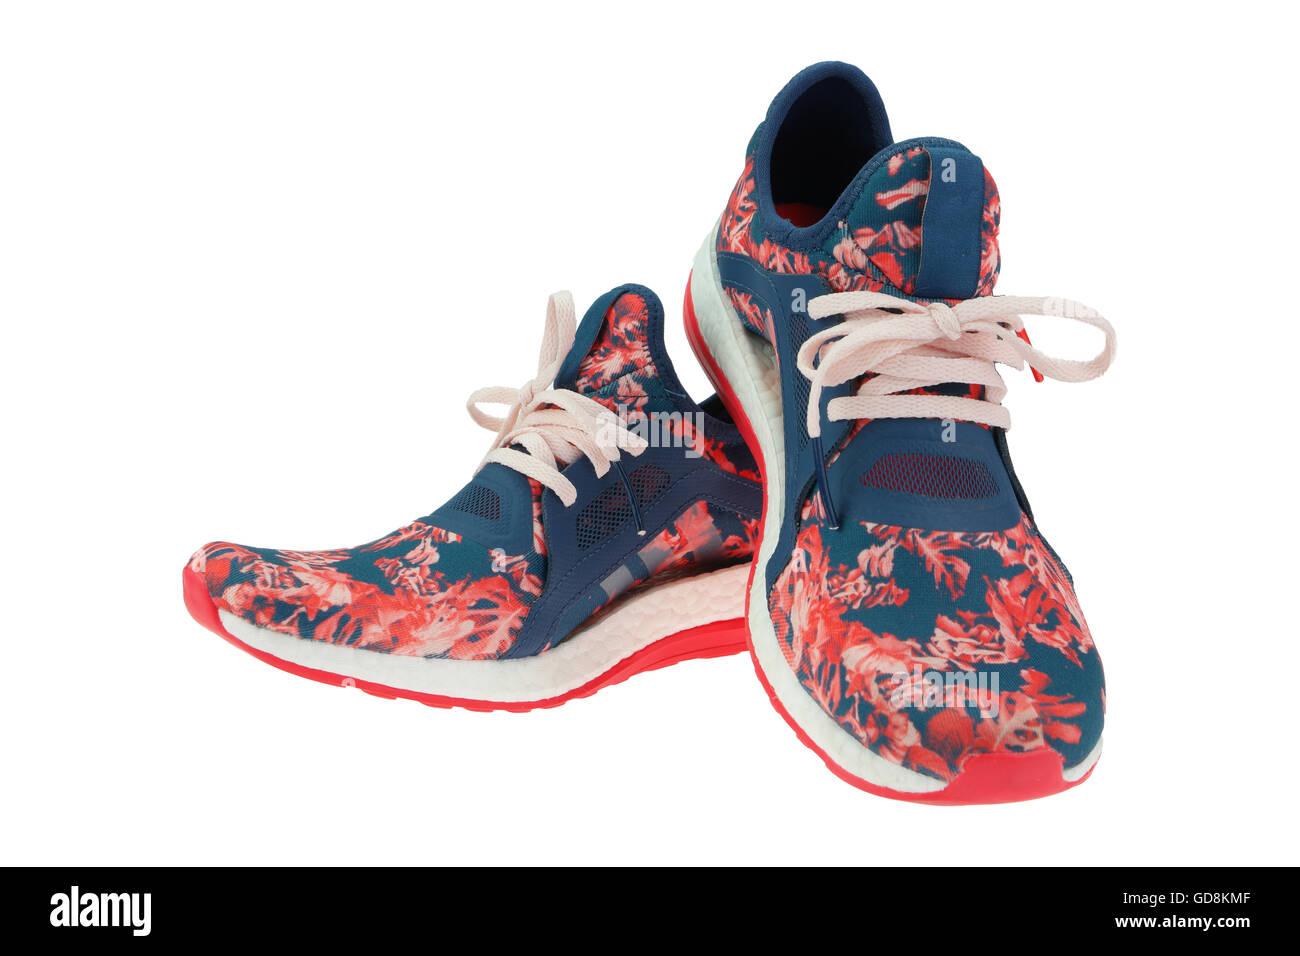 athletic shoes isolated Stock Photo